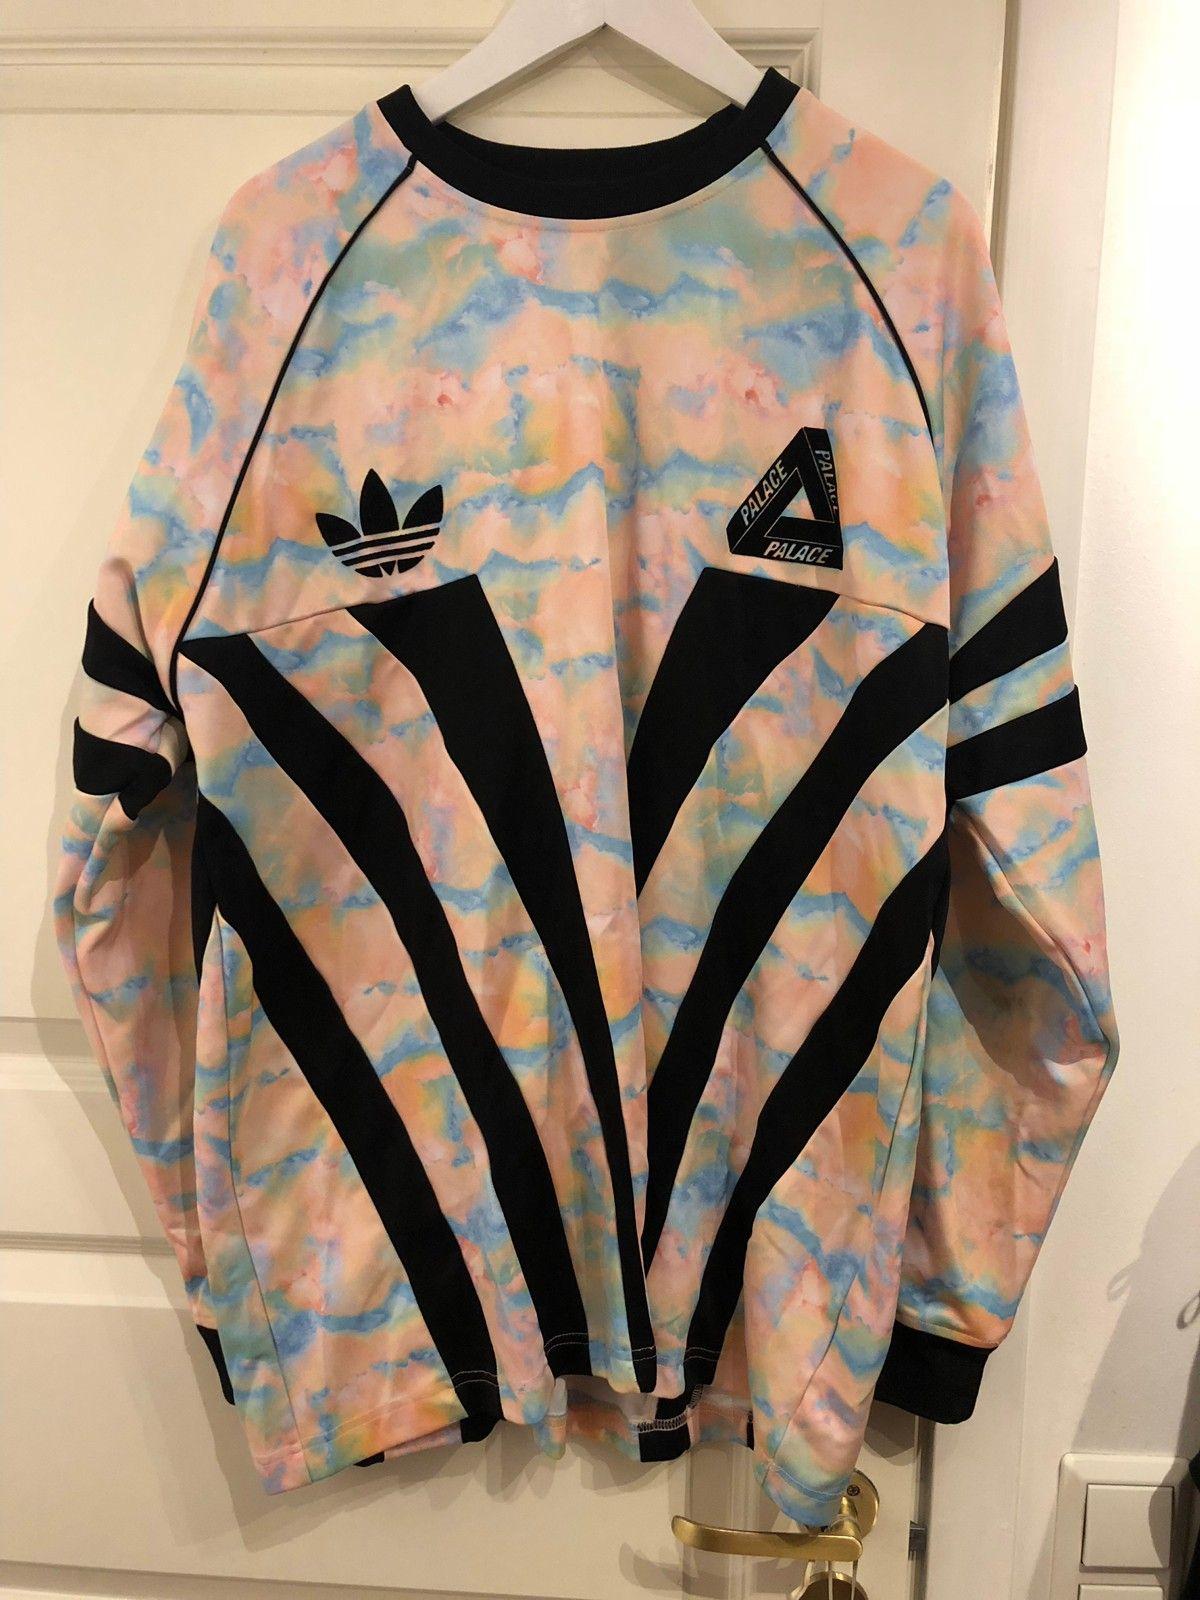 100% authentic e16d0 9c514 Adidas X Palace Multicolor Football Jersey   FINN.no